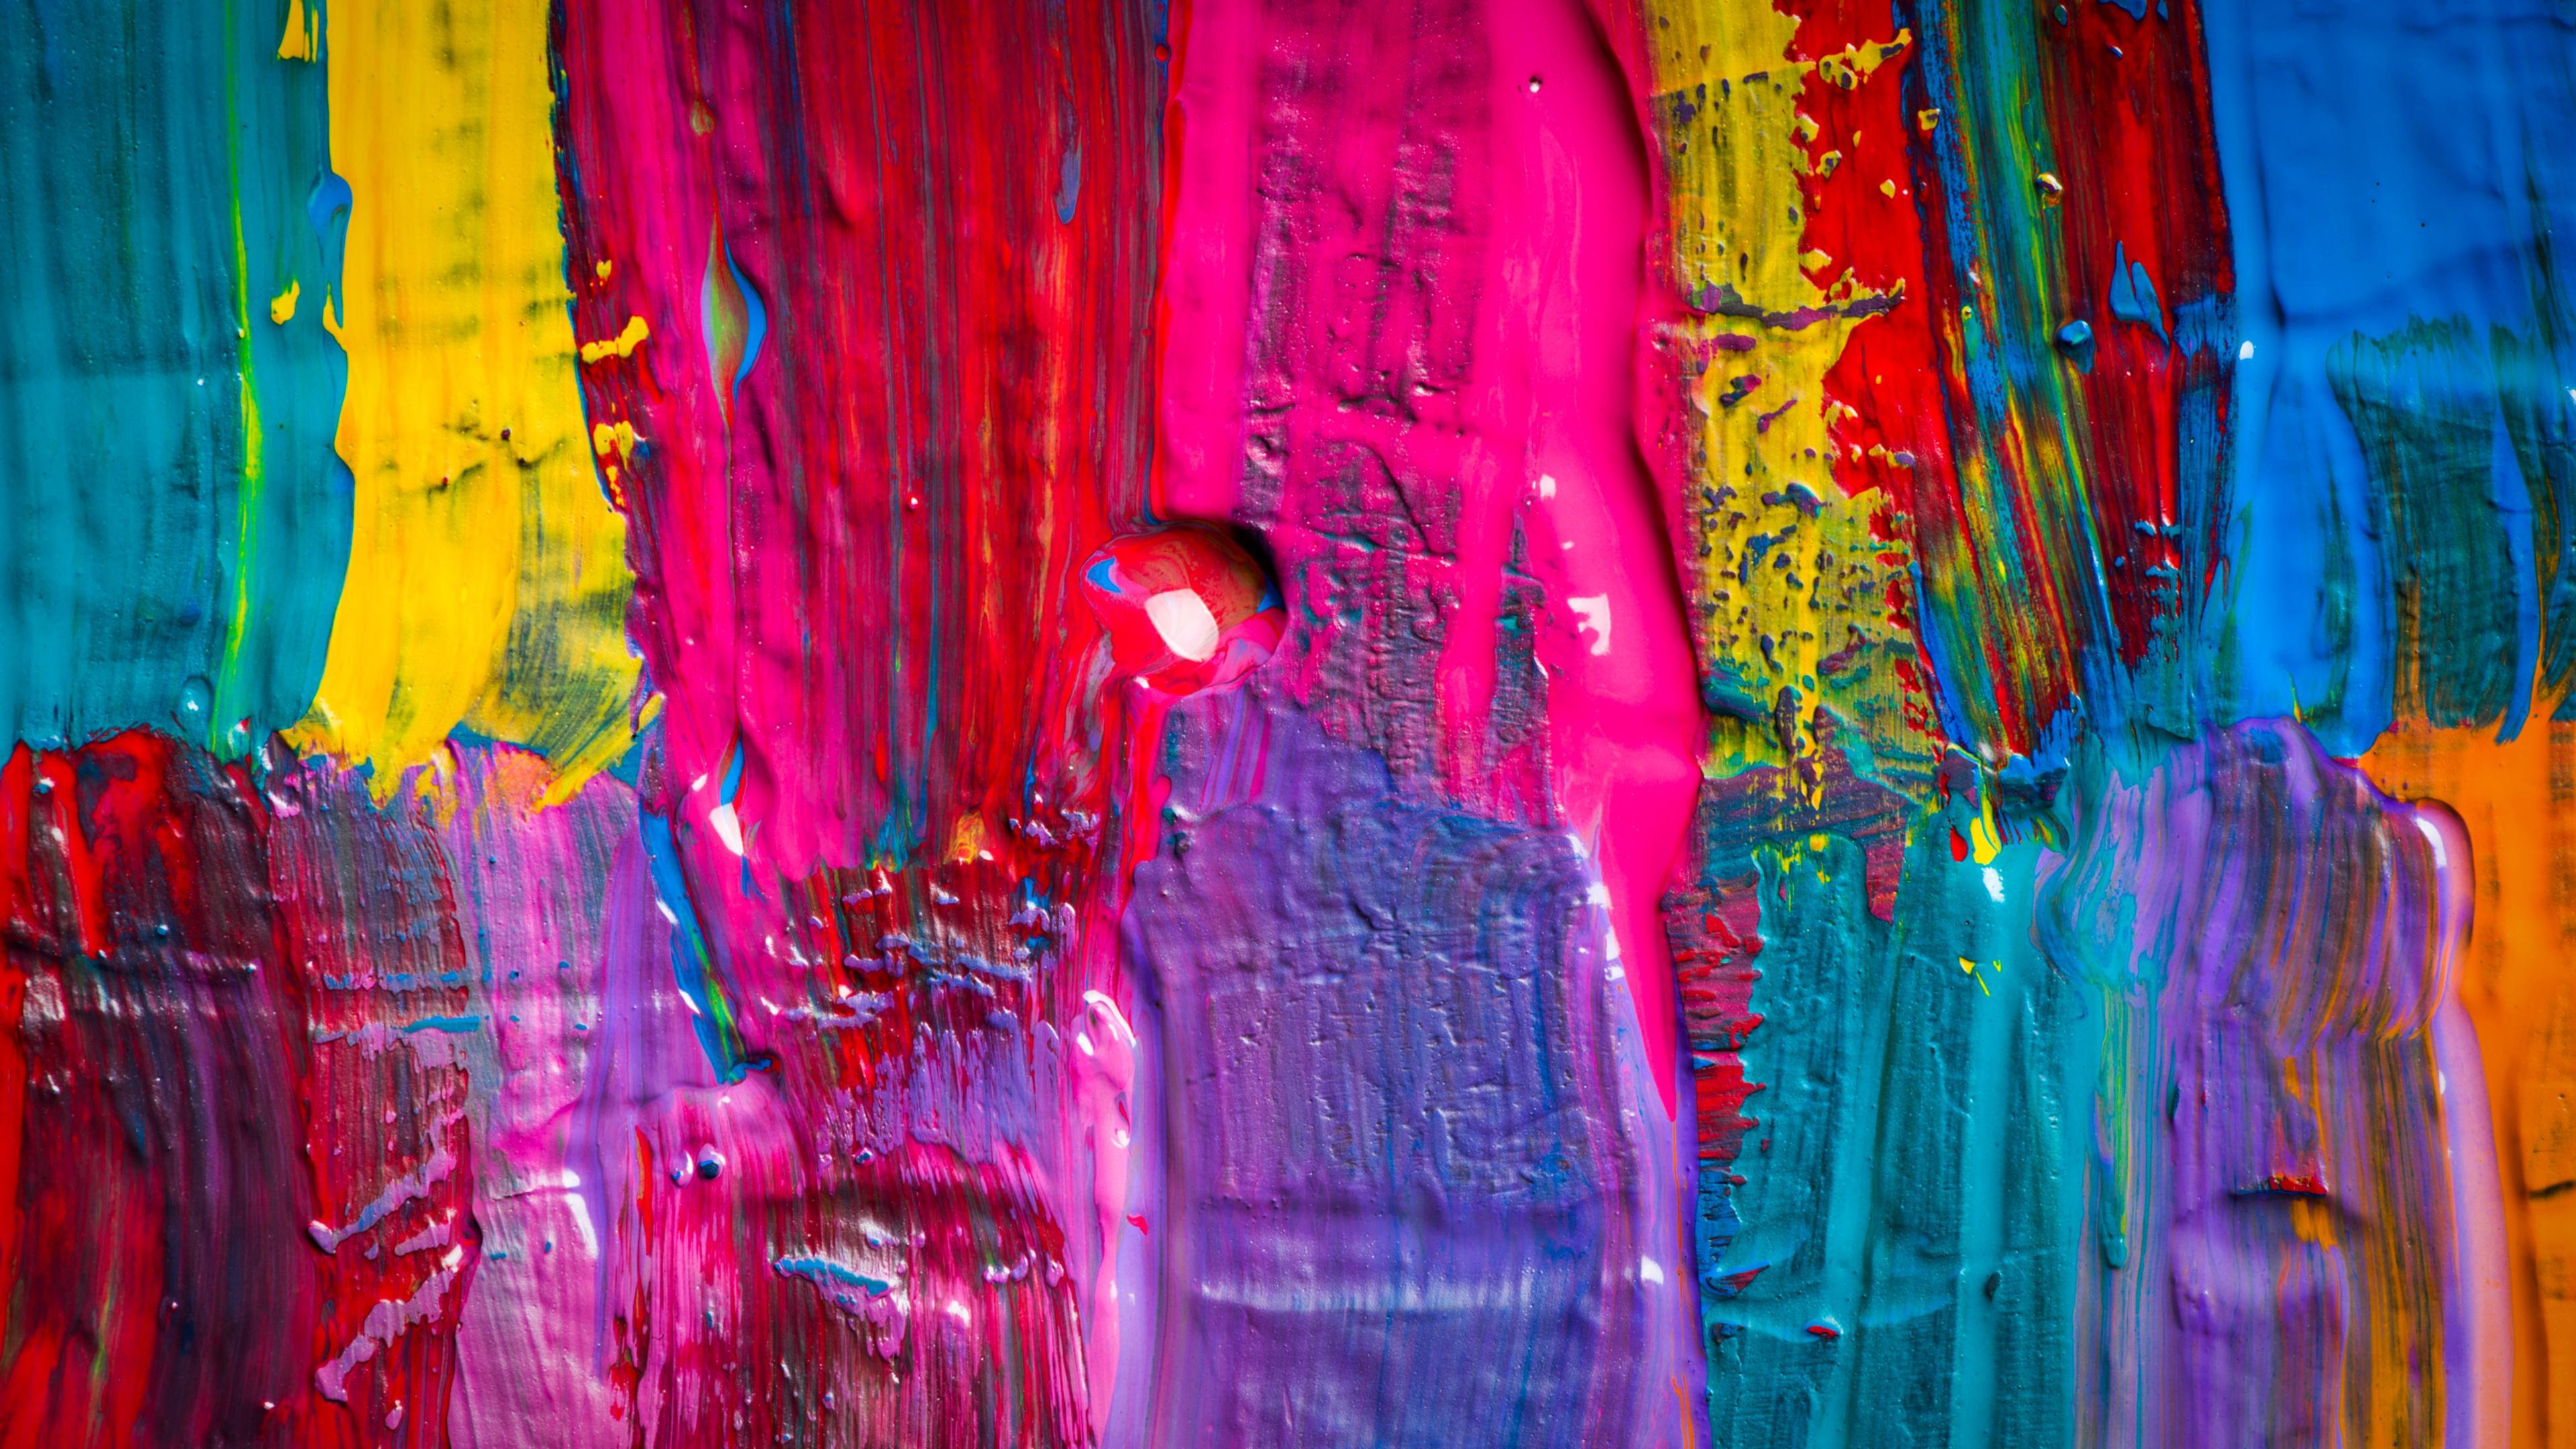 Color Splash 4k Wallpaper